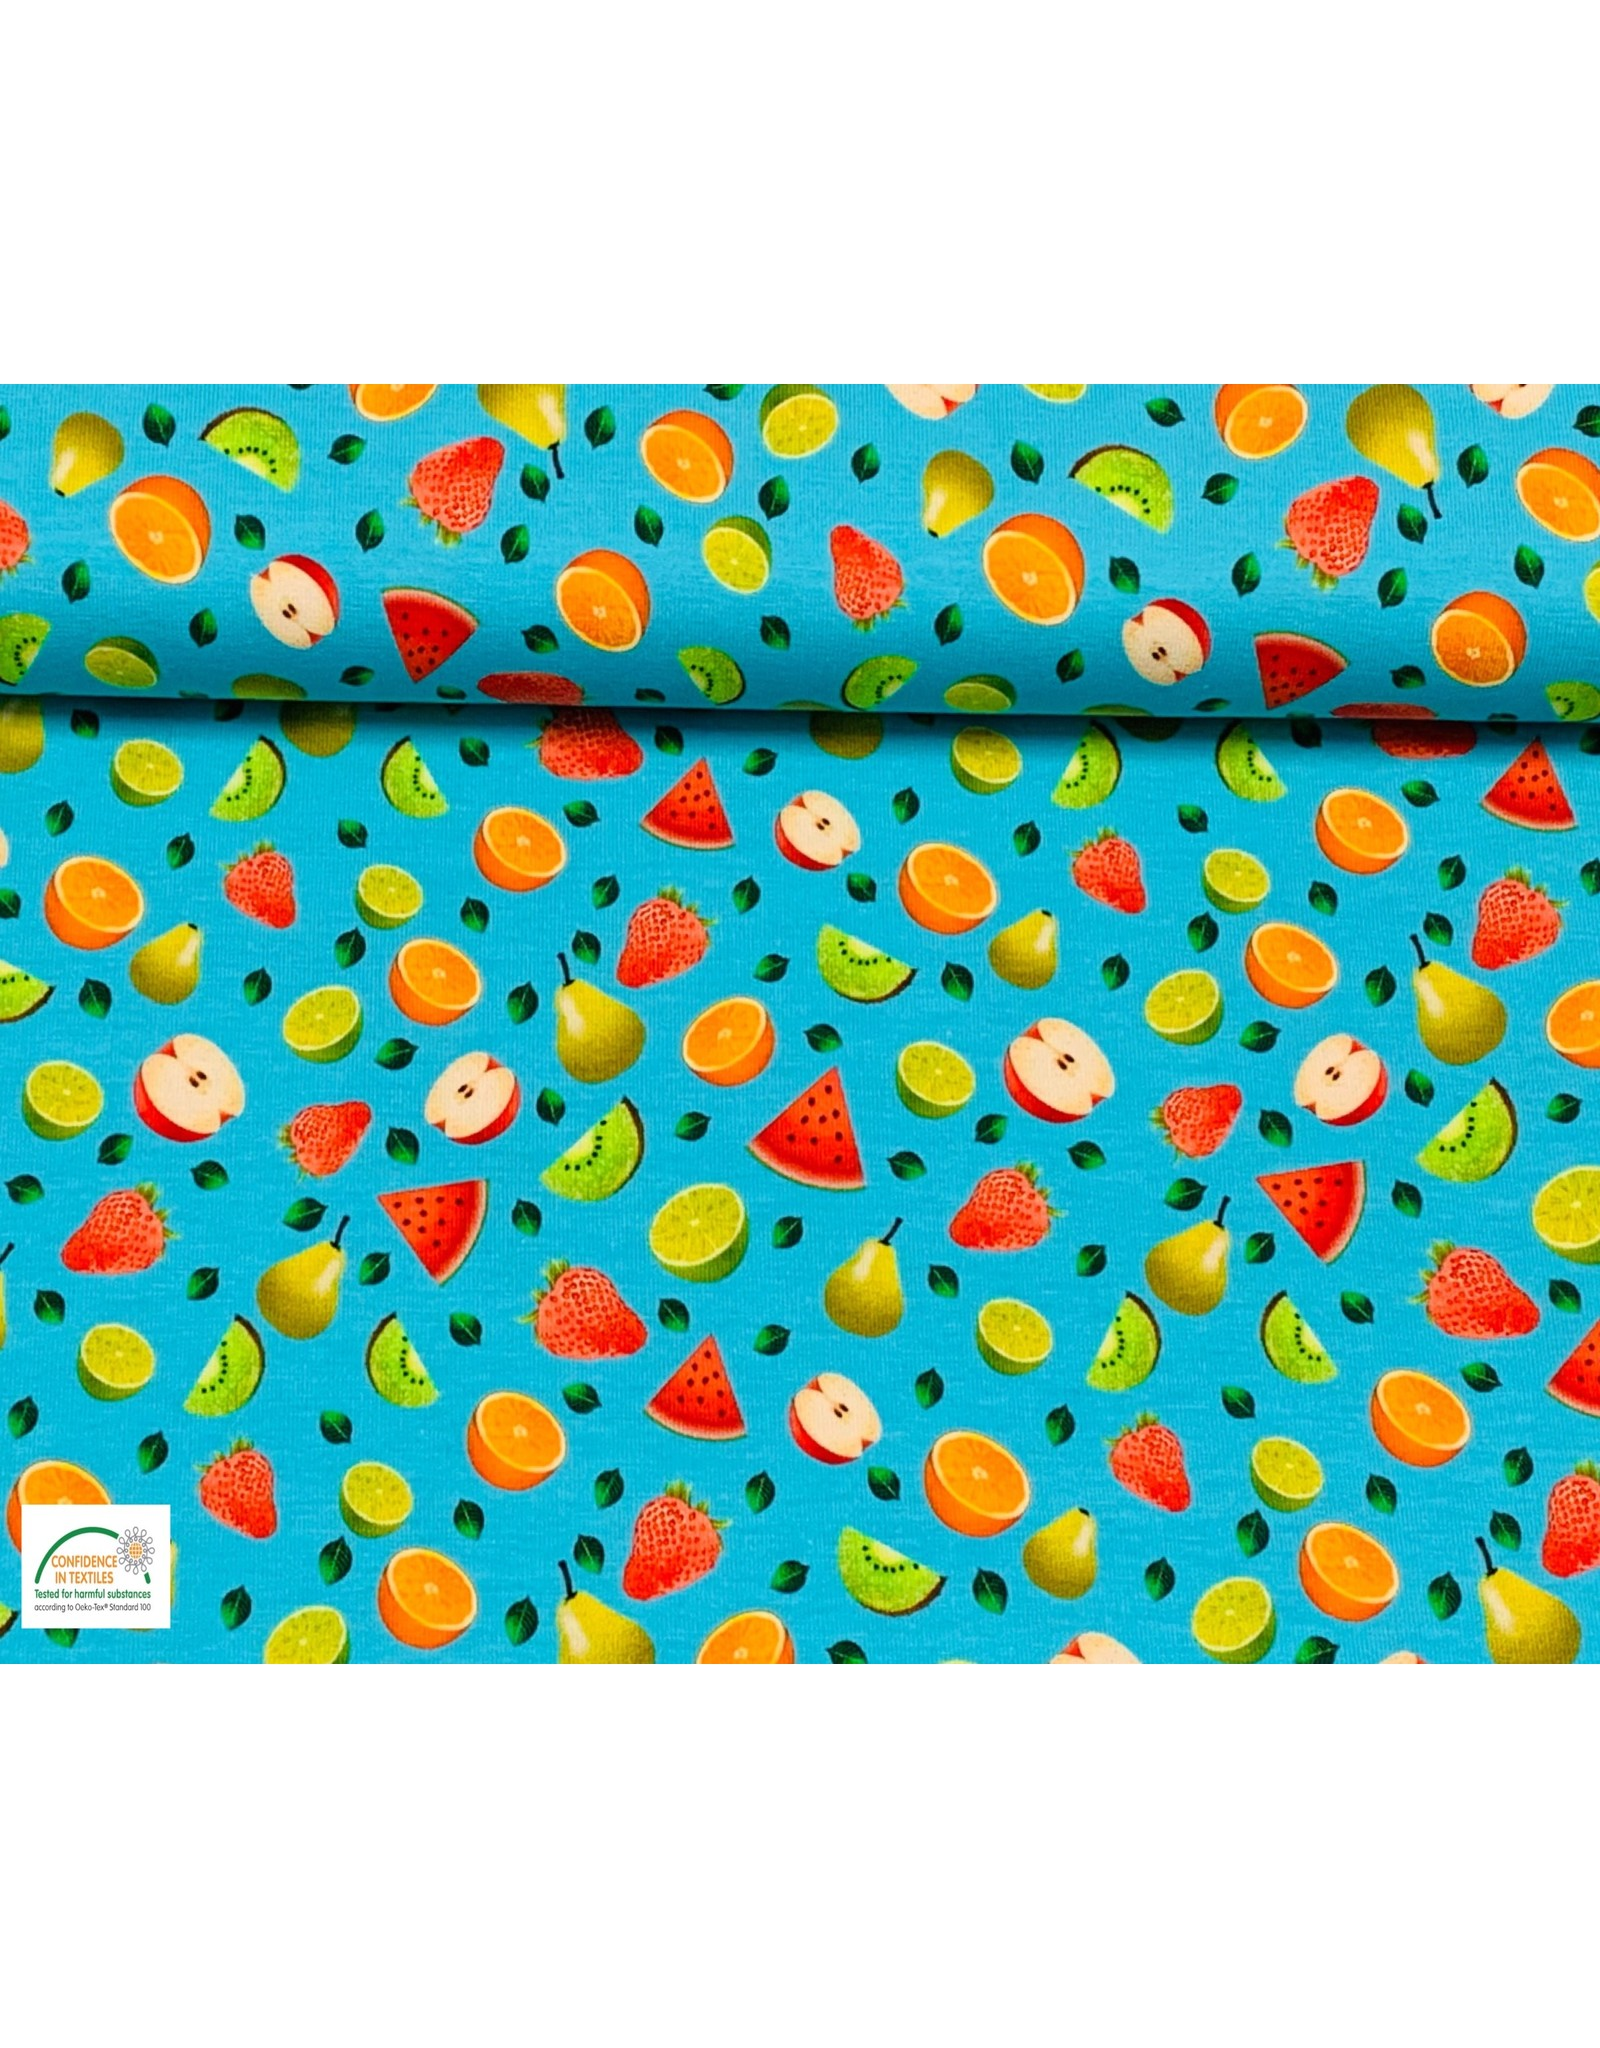 Megan Blue Fabrics Bauwmolljersey Fruits aqua